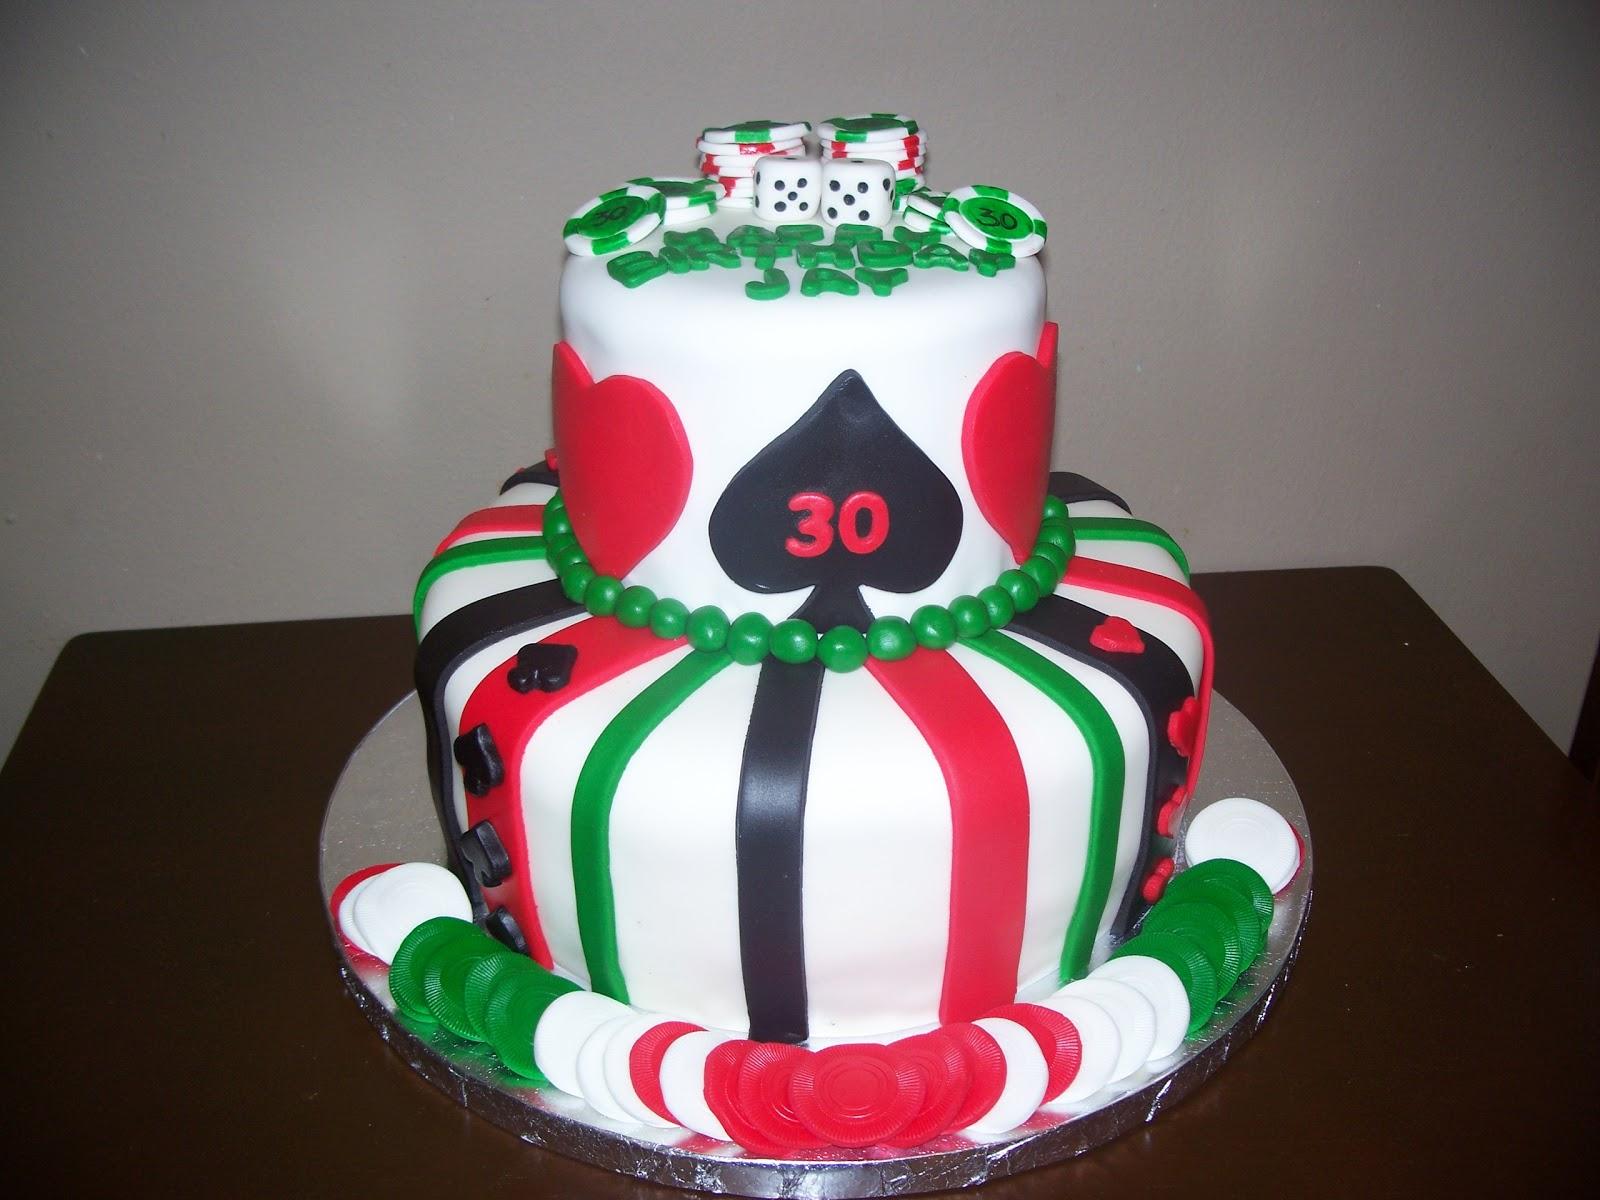 Sweetdaisycakes Poker Themed 30th Birthday Cake